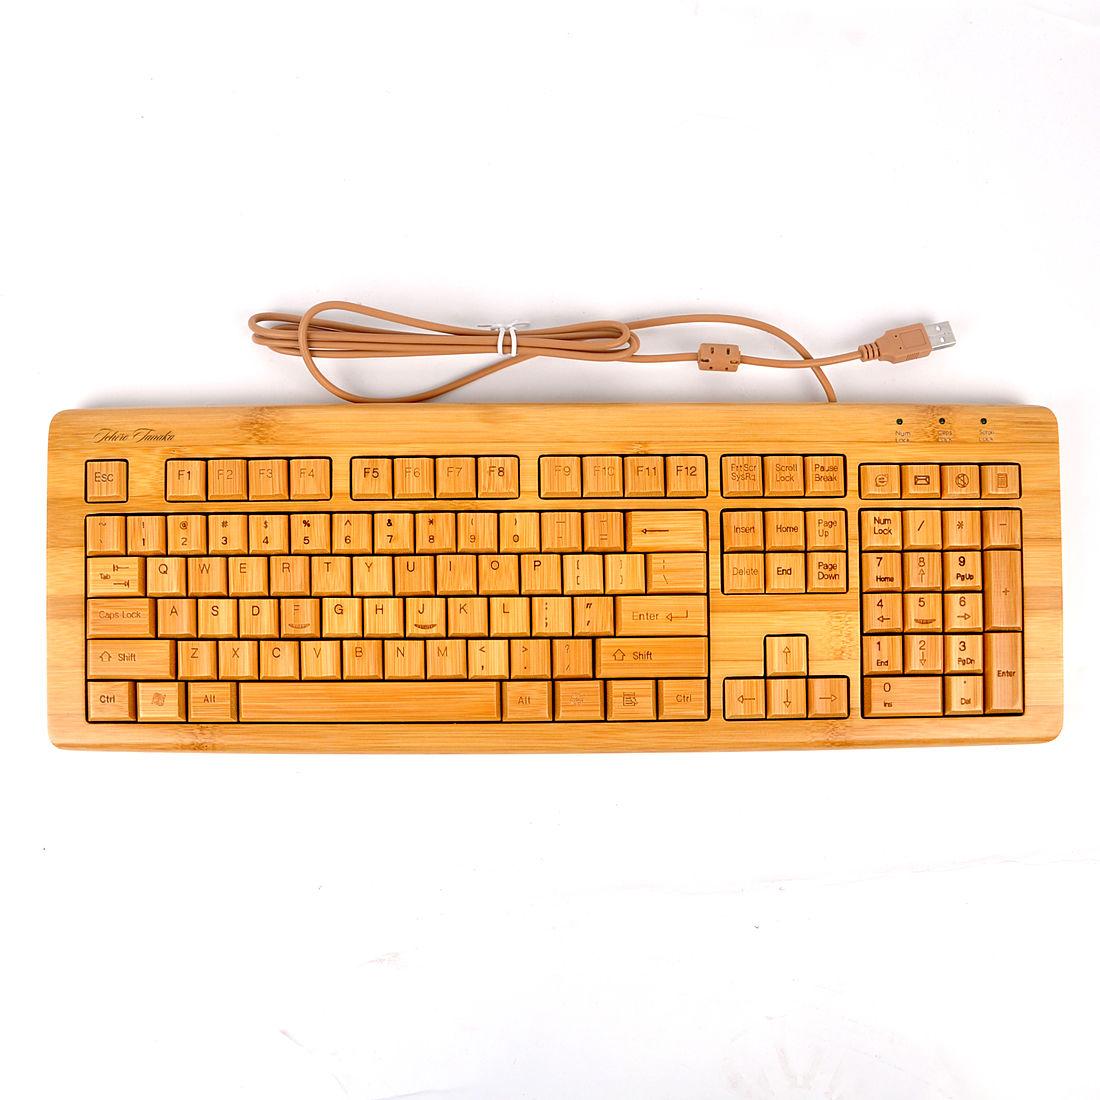 楽天市場 lifesign名入れ無料 生活用品 竹製キーボード usb接続 有線